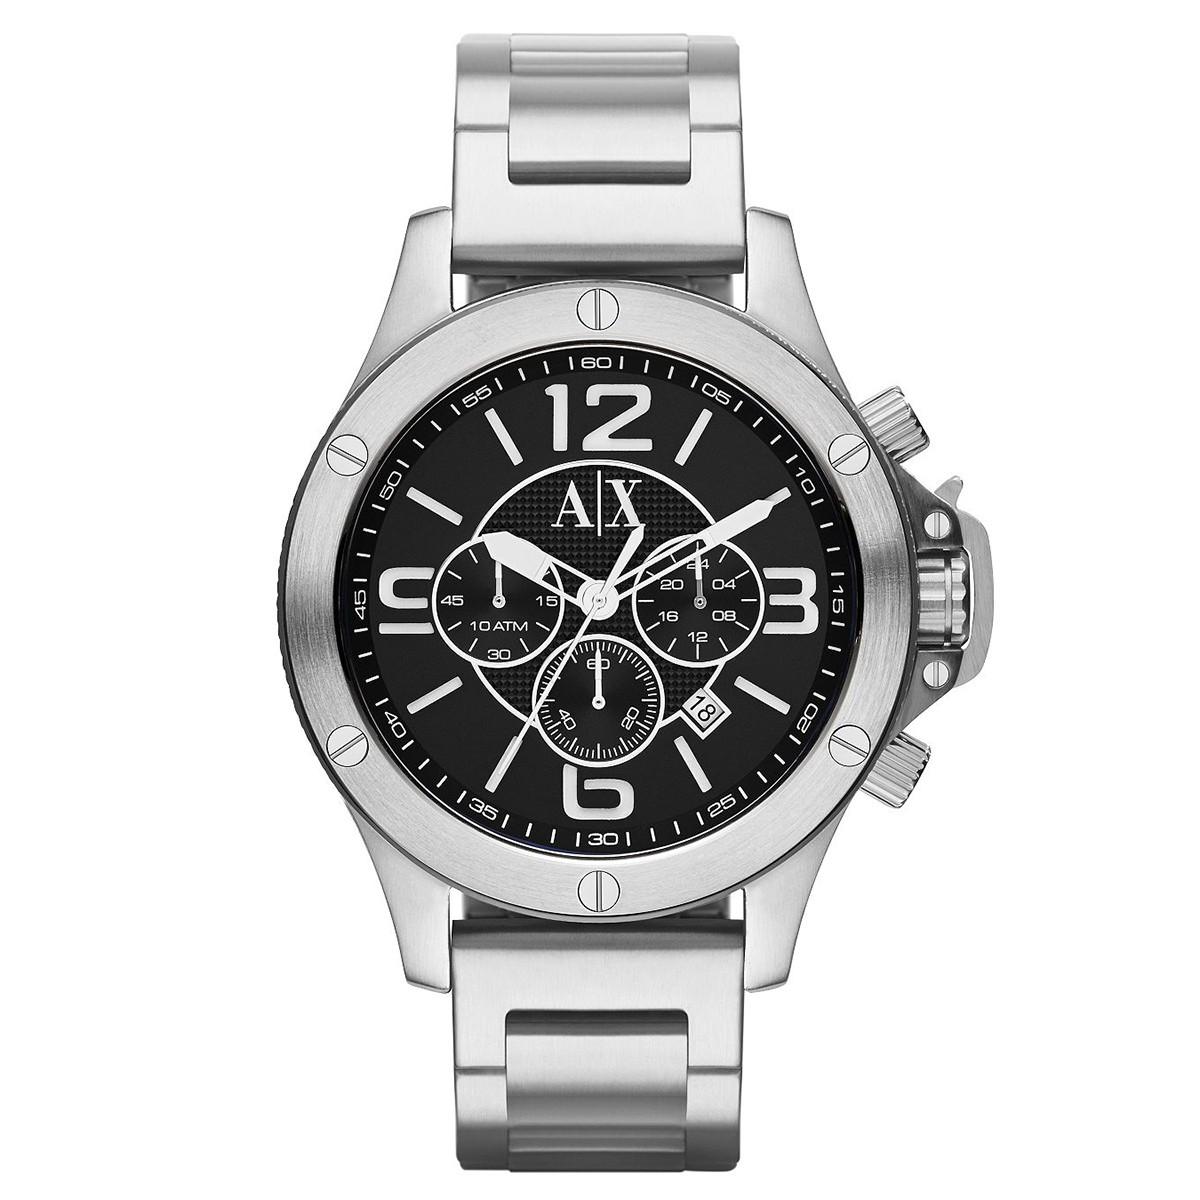 b667f4ae977 Compre Relógio Armani Exchange em 10X